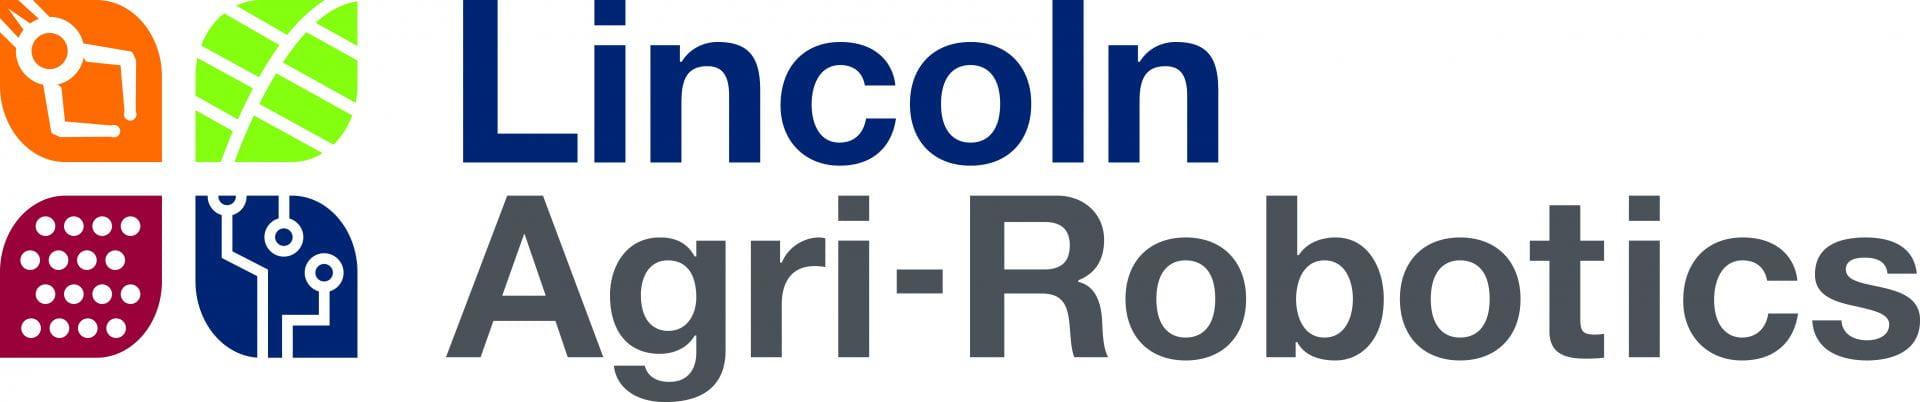 LINCOLN UNIVERSITY RESEARCH CENTRE - AGRI ROBOTICS